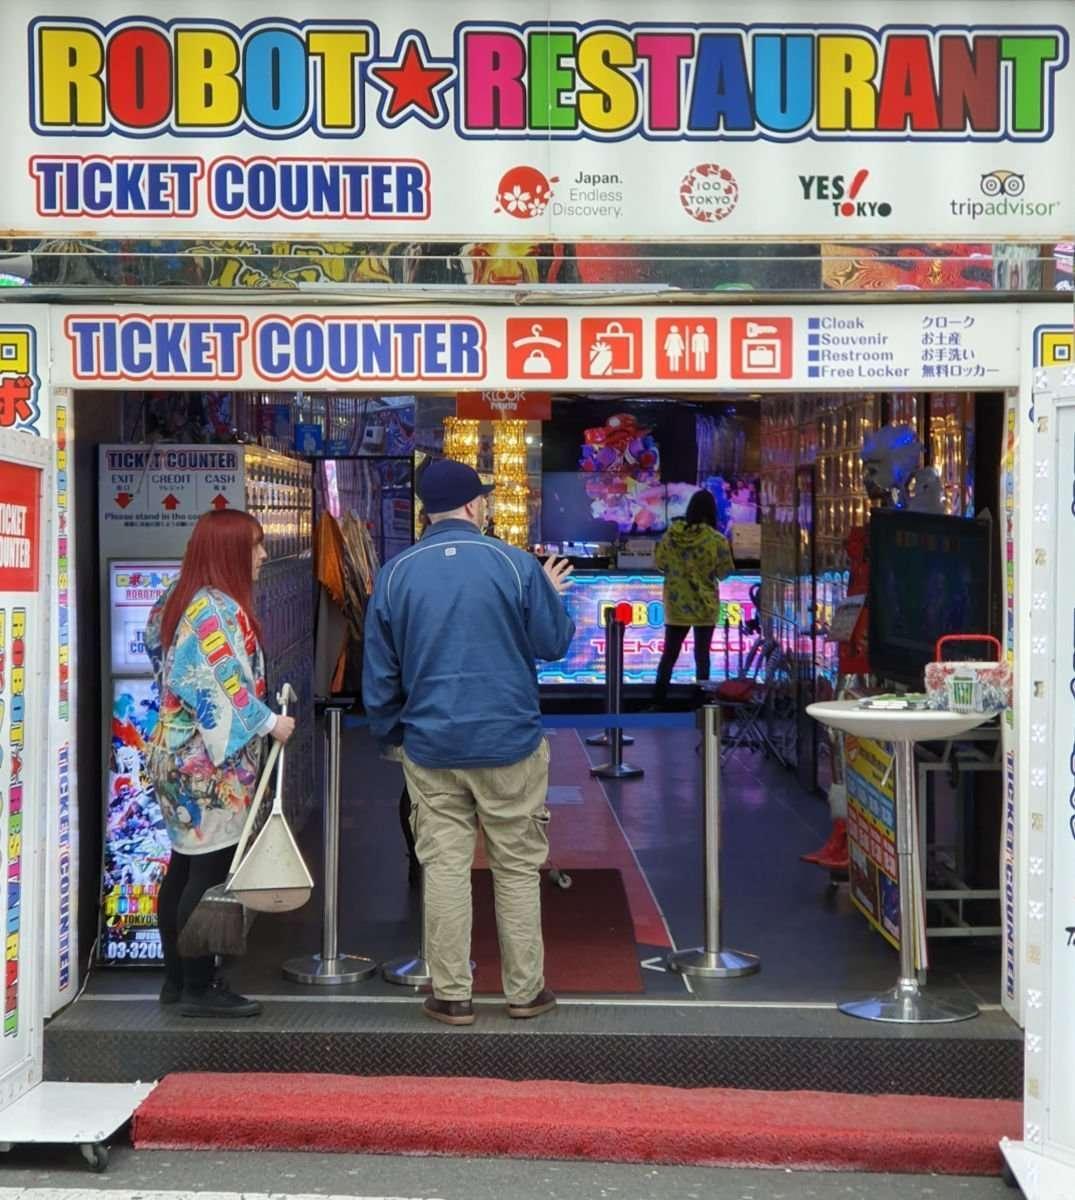 Robot Restaurant Ticket Counter